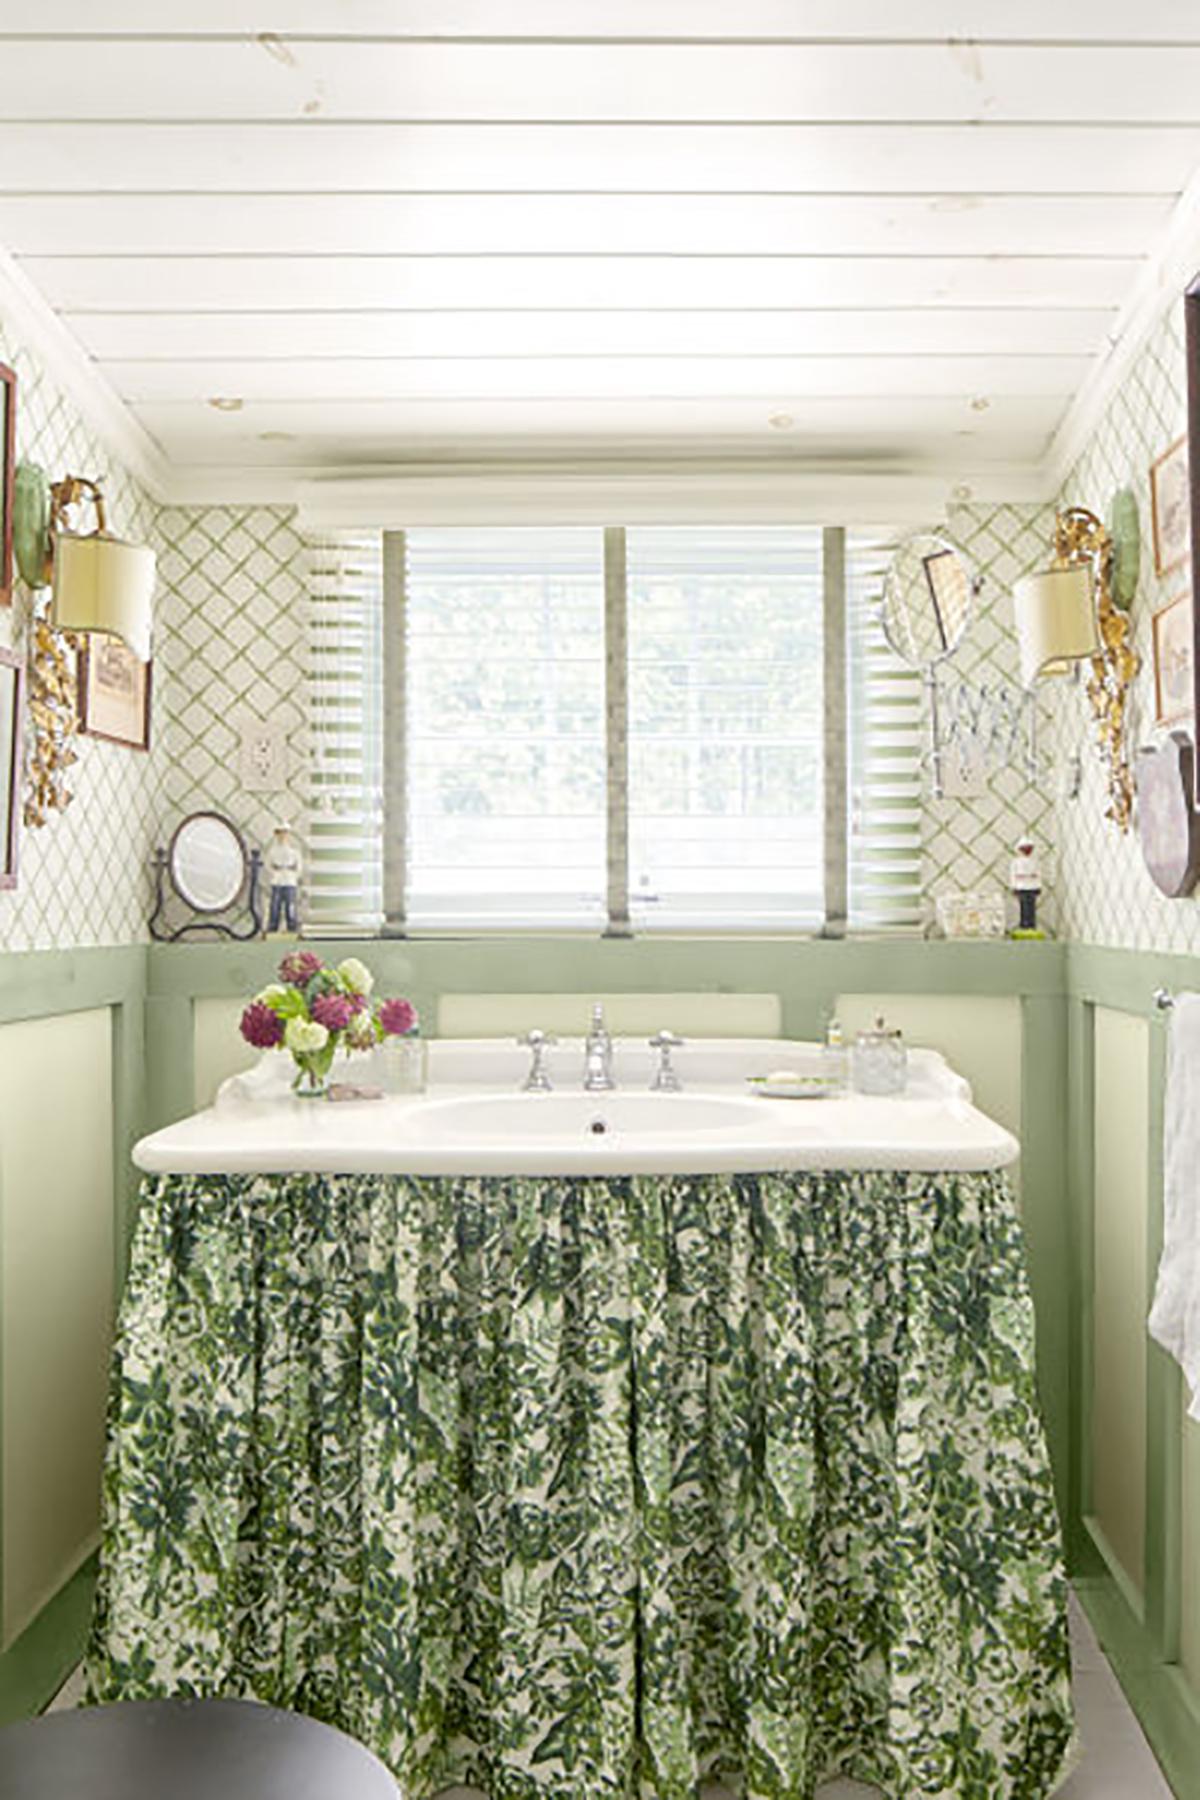 Amazing 80+ Best Bathroom Decorating Ideas   Decor U0026 Design Inspirations For  Bathrooms